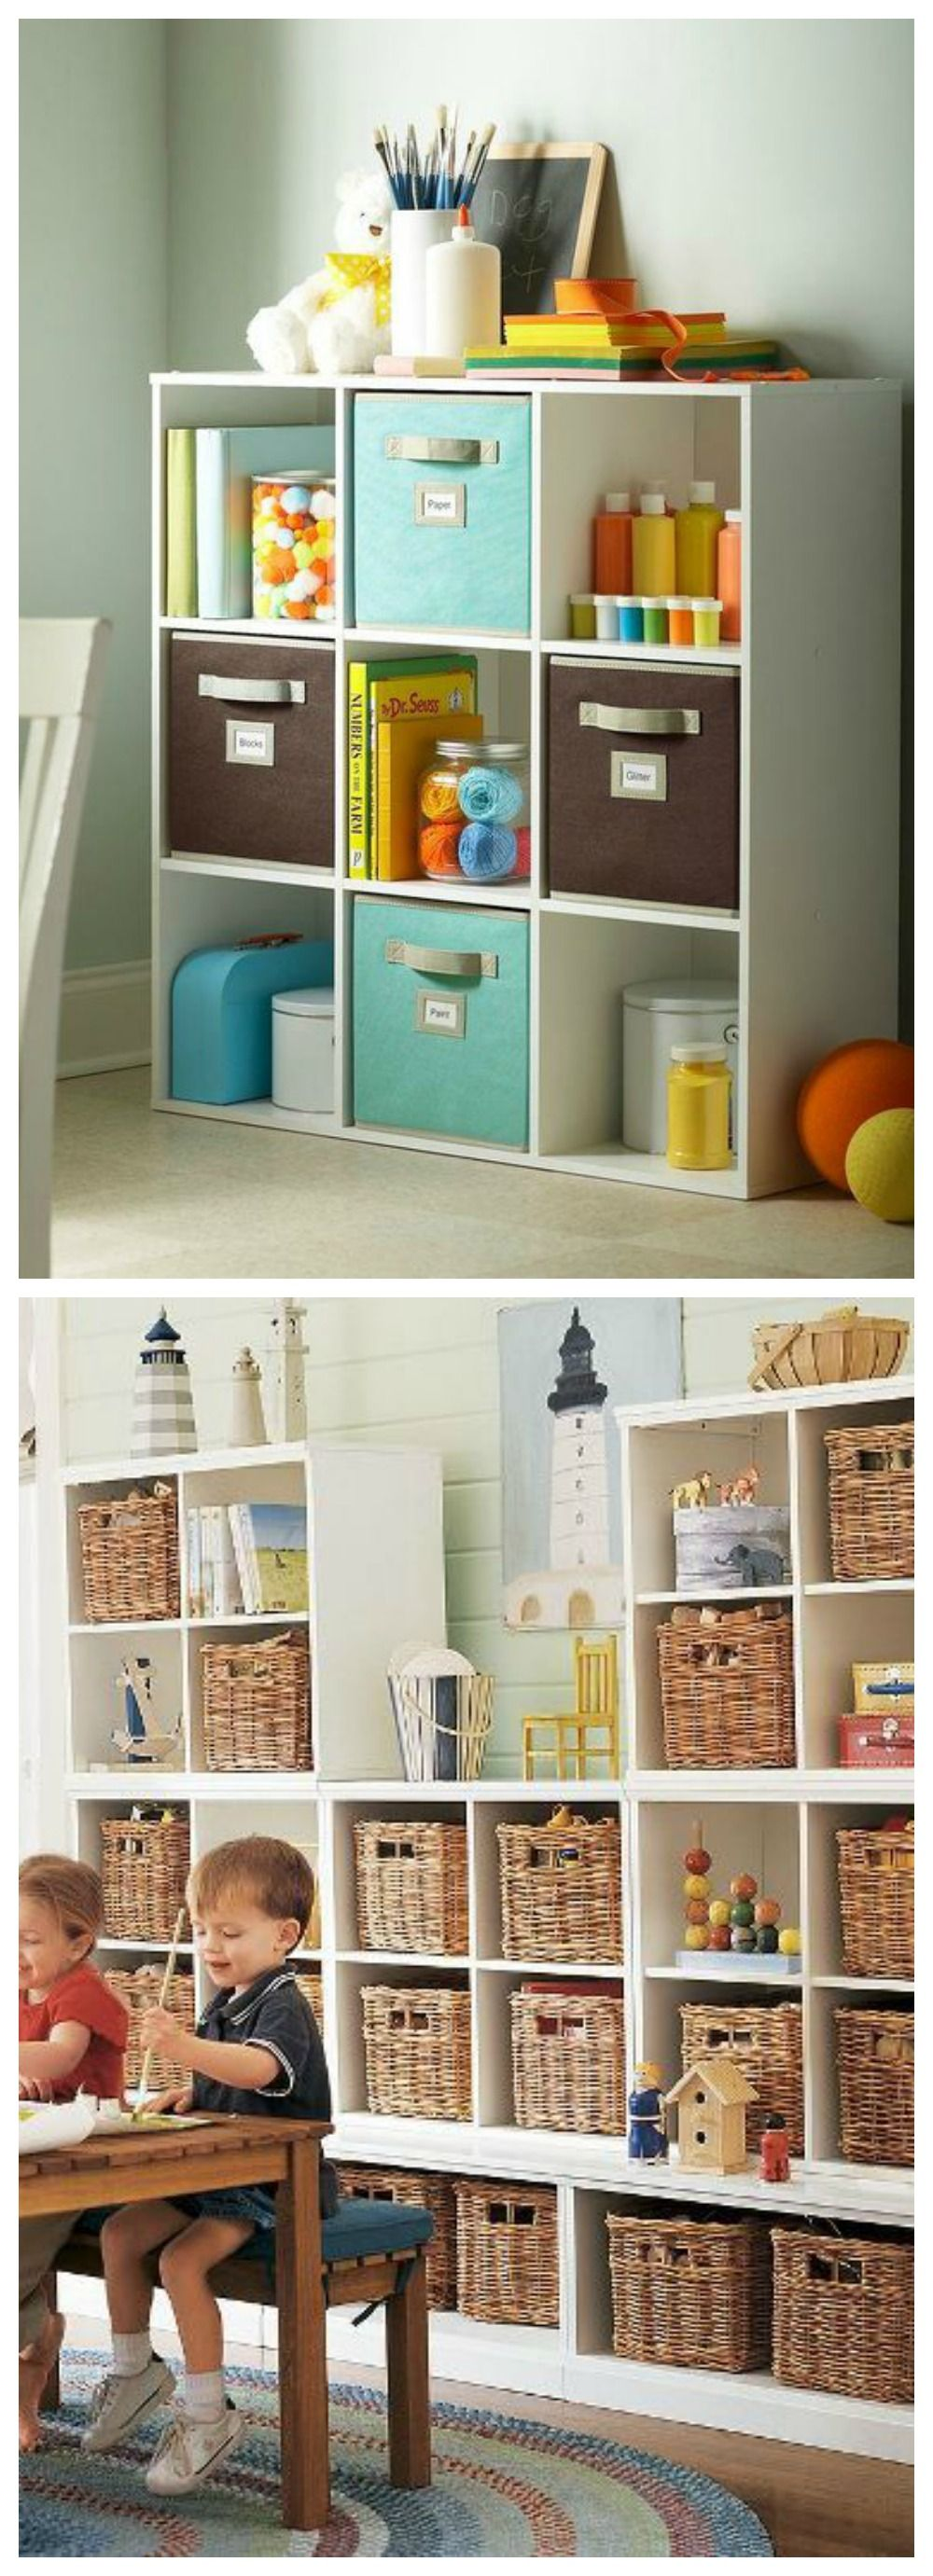 Guardar juguetes cestas blog guardar juguetes pinterest guardar juguetes cestas y juguetes - Estanterias guardar juguetes ...